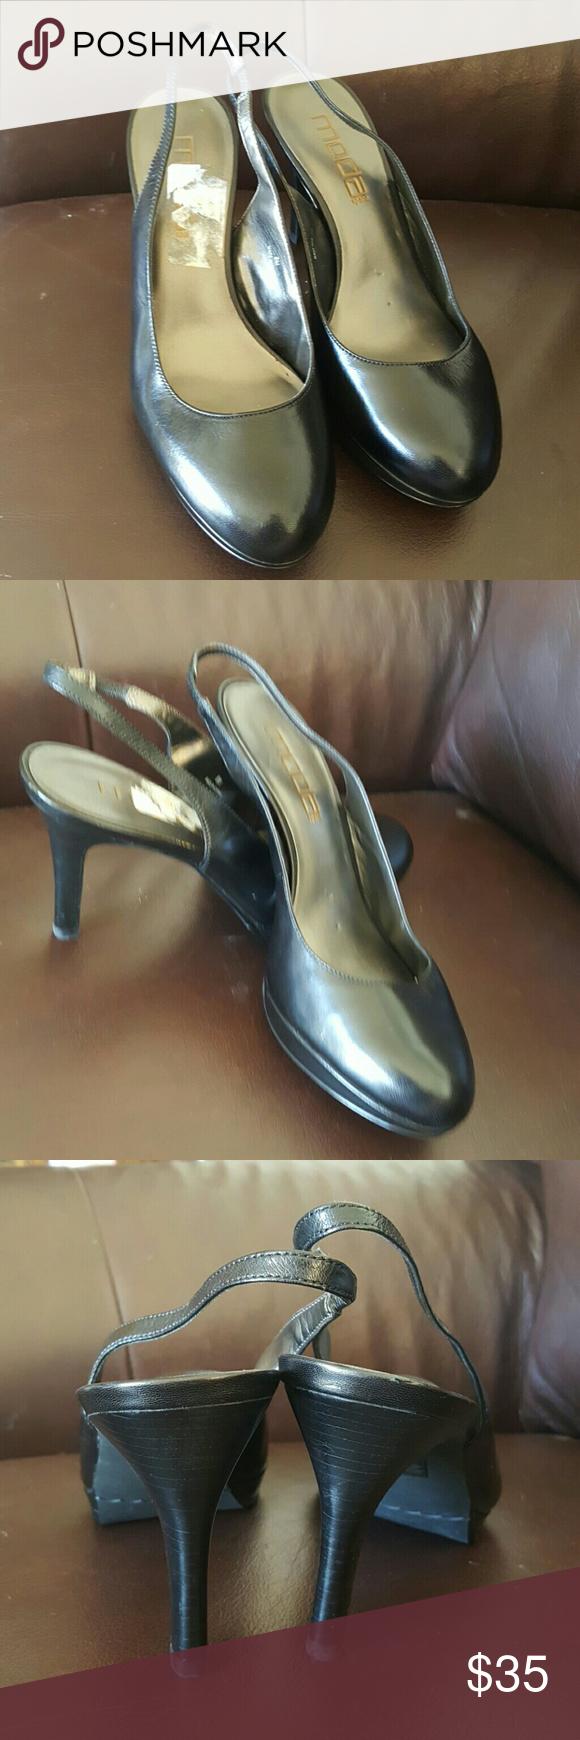 Round toe platform slingback leather pumps Great work shoes, never worn, brand new!! Moda International Shoes Heels